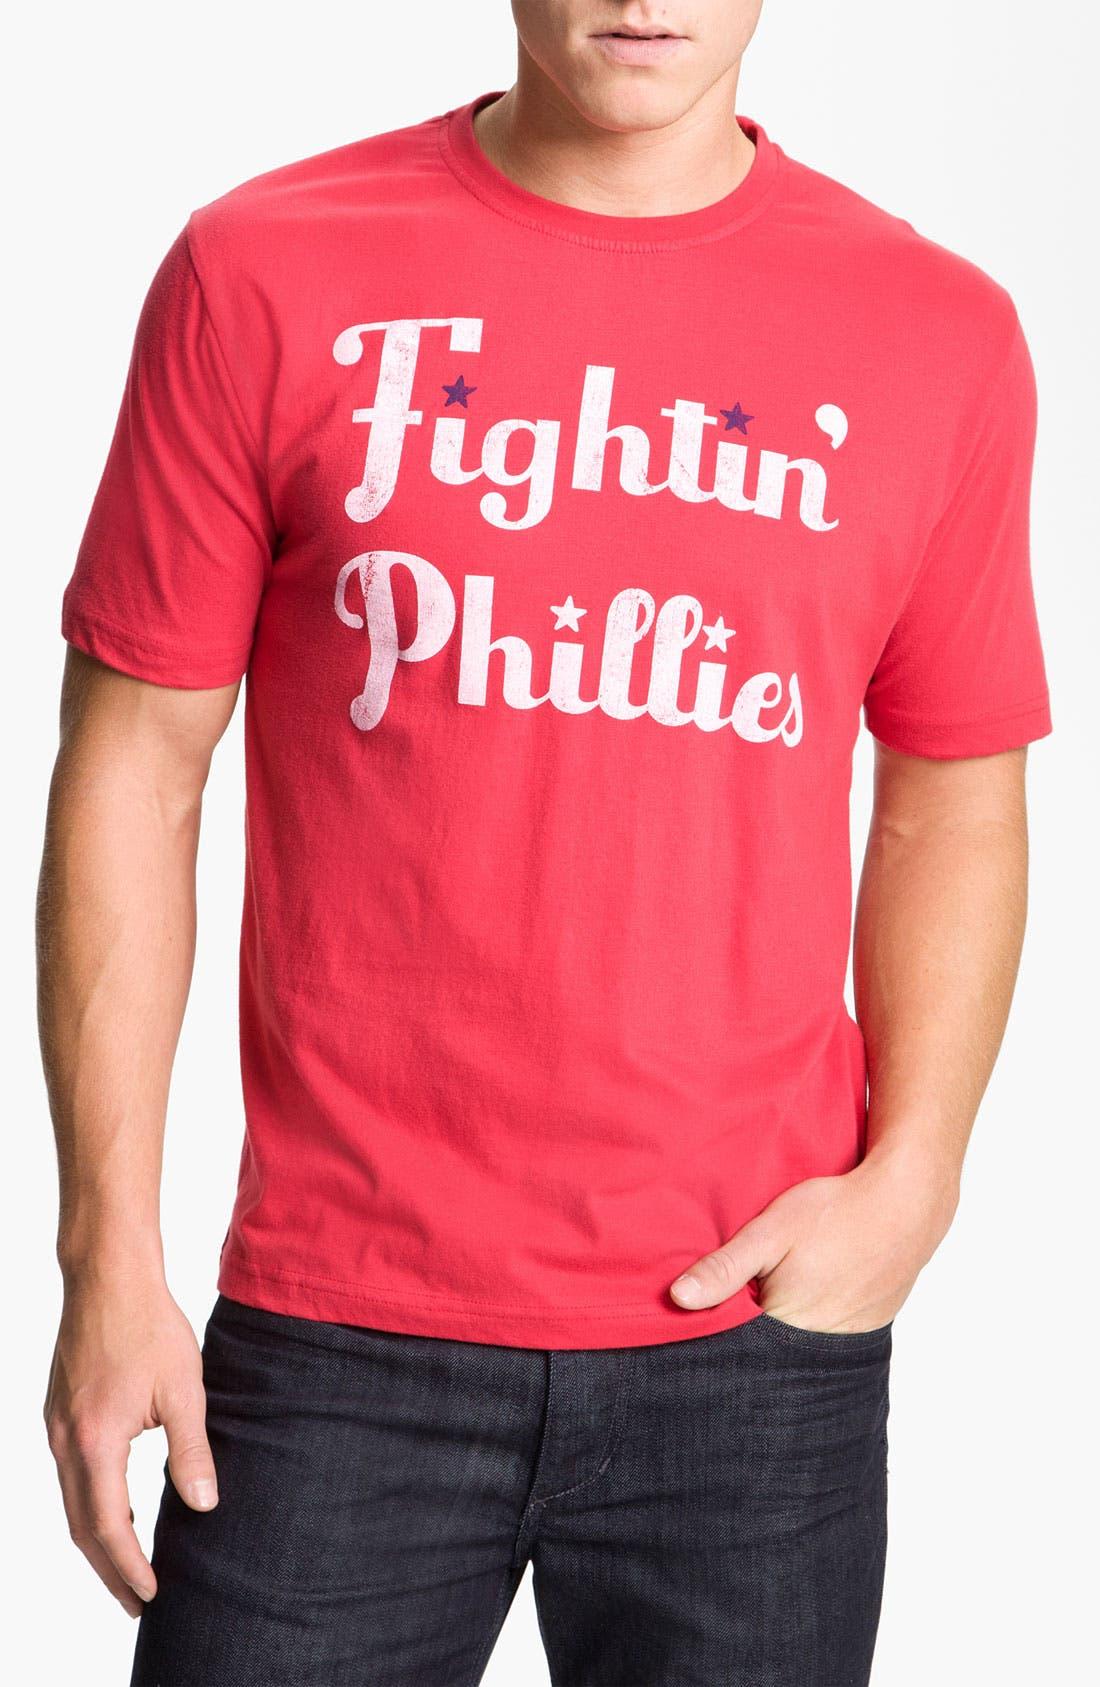 Alternate Image 1 Selected - Wright & Ditson 'Philadelphia Phillies' Baseball T-Shirt